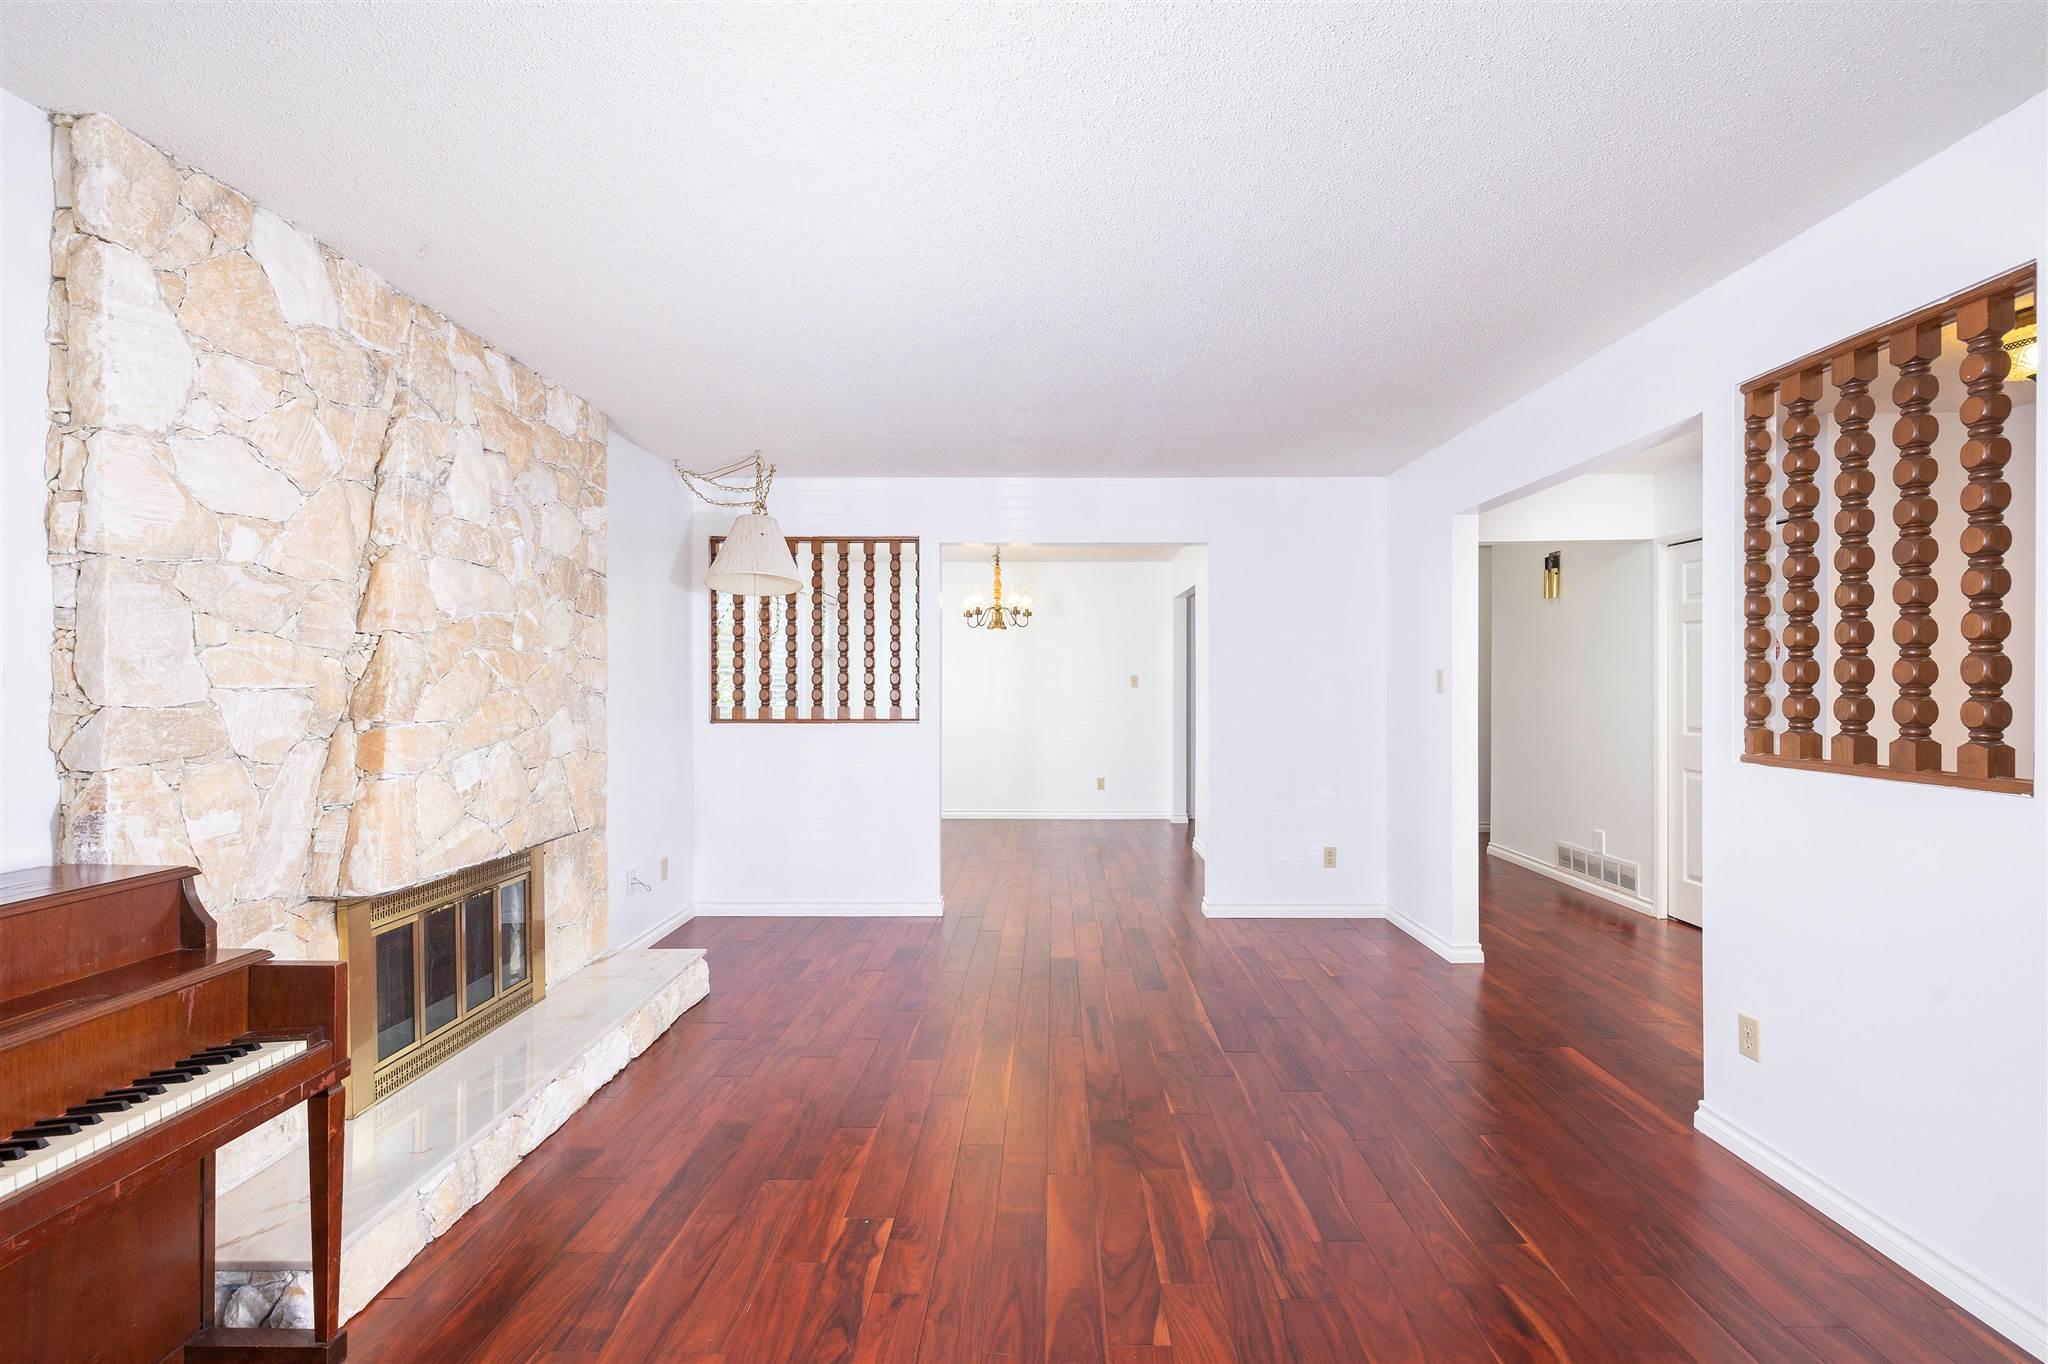 1743 148A STREET - Sunnyside Park Surrey House/Single Family for sale, 3 Bedrooms (R2604804) - #5